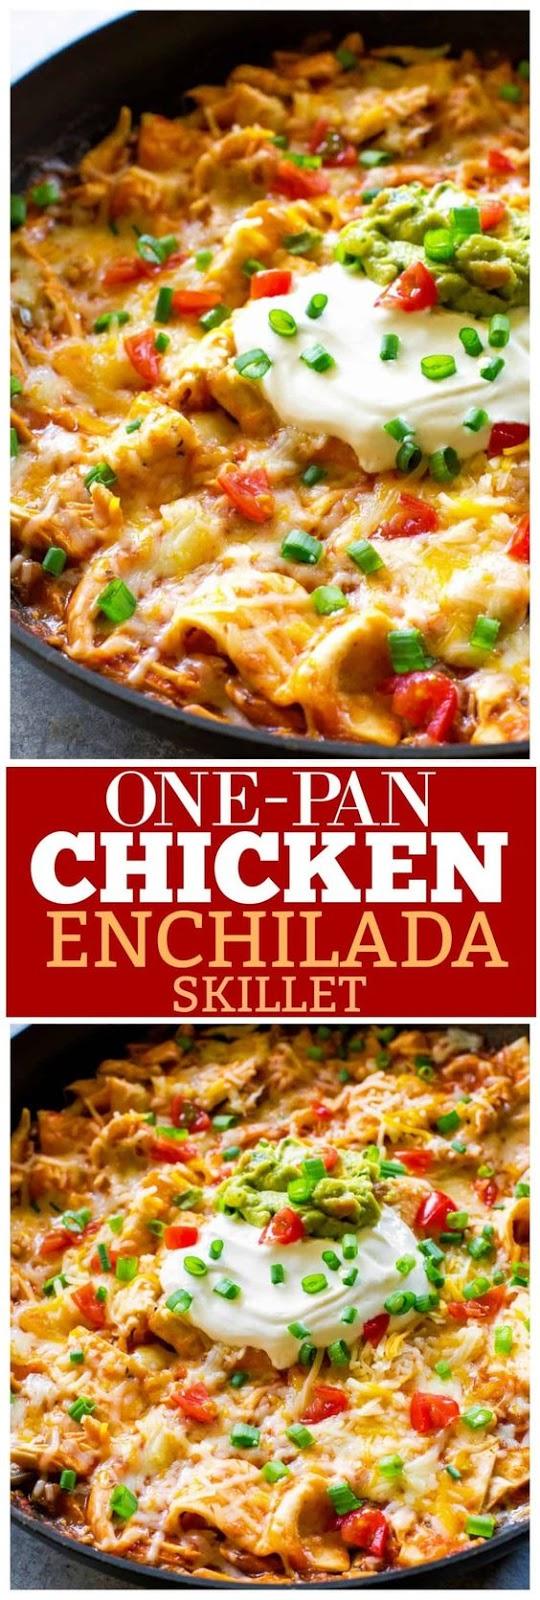 One Pan Chicken Enchilada Skillet